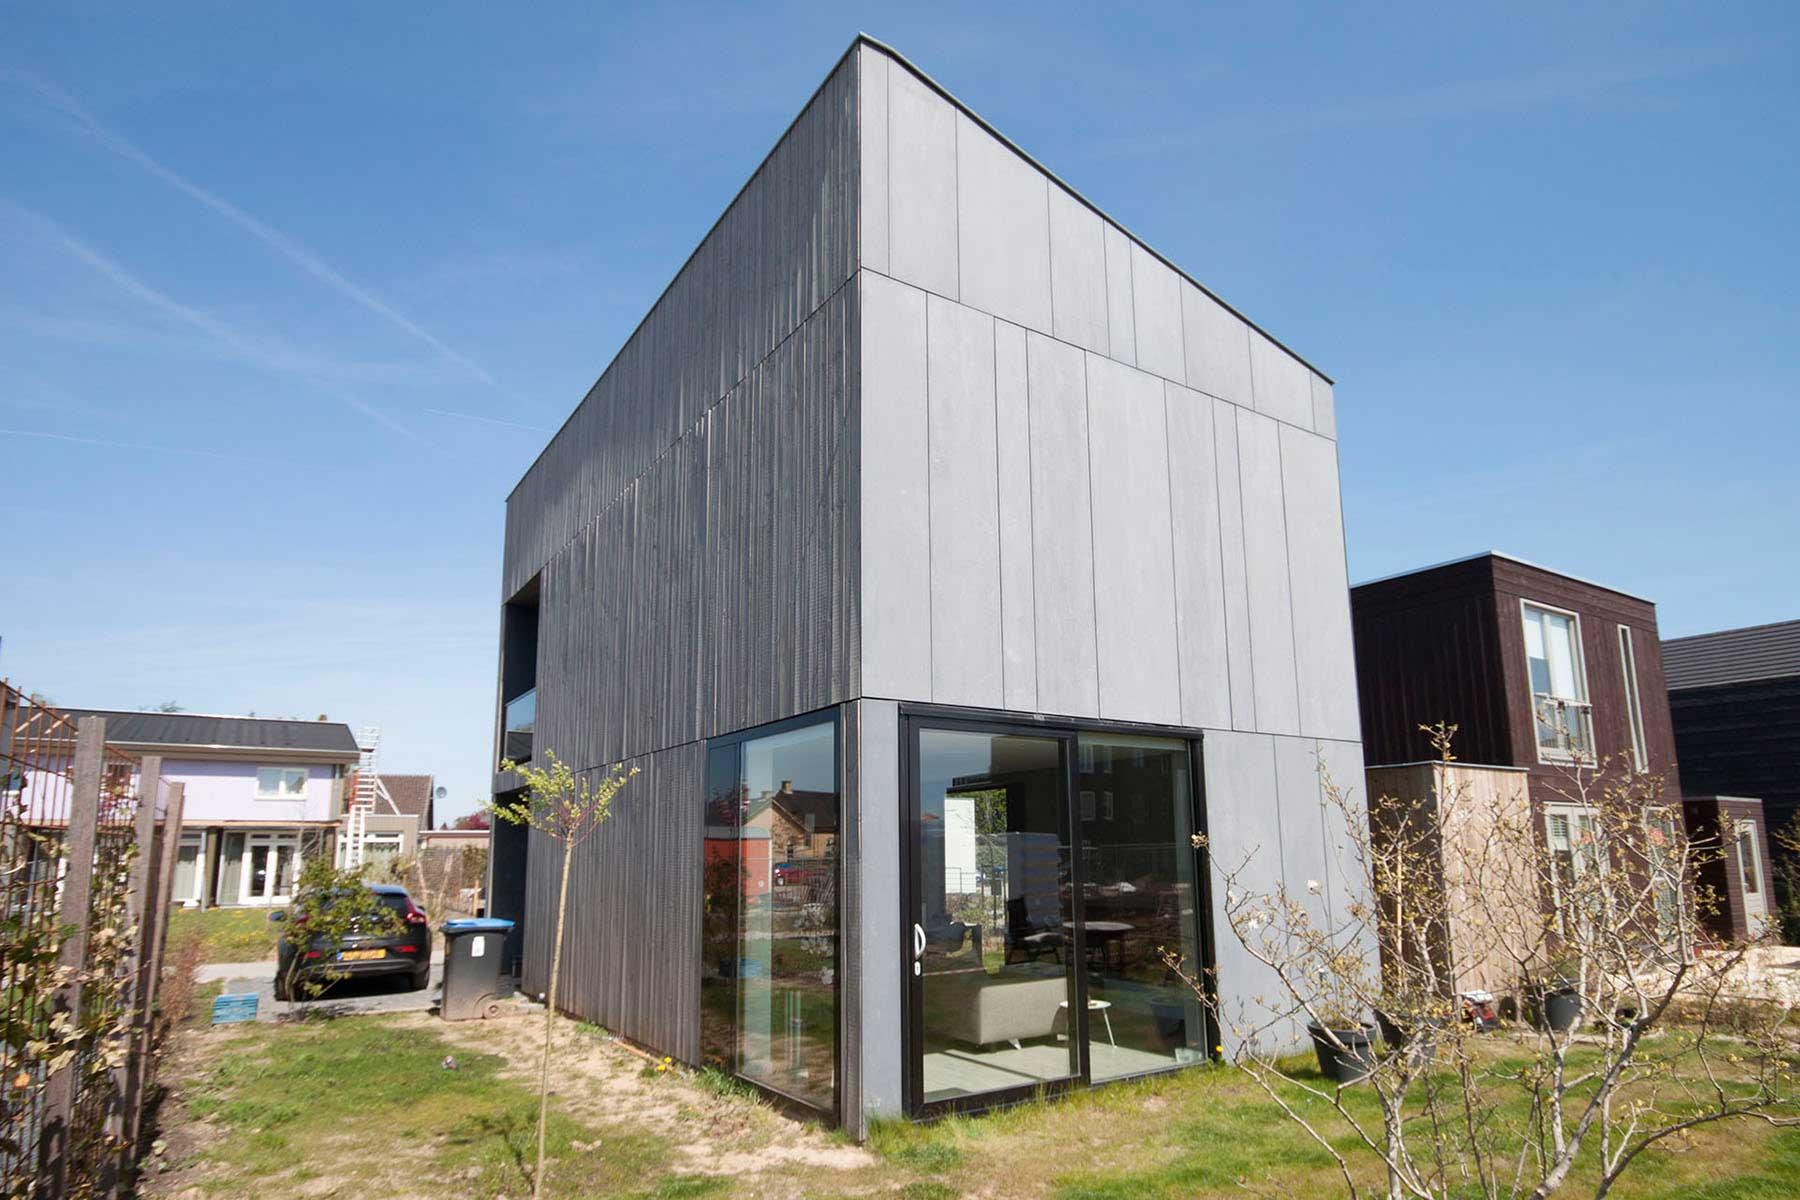 8A-Architecten-datcha-house-2-Lent-02